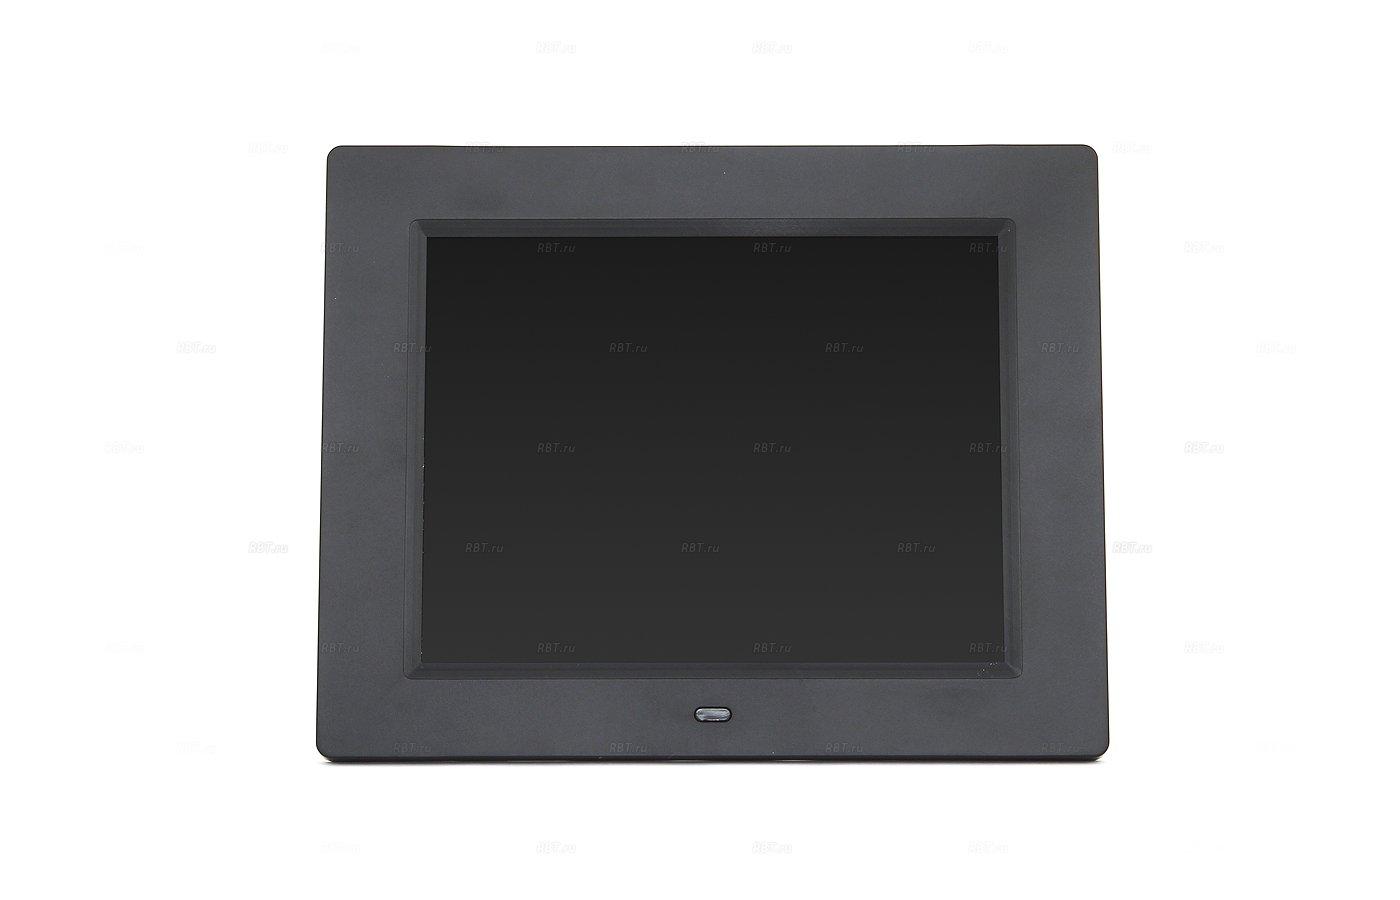 Цифровая фоторамка Digma 8 PF-833 1024x768 черный пластик ПДУ Видео